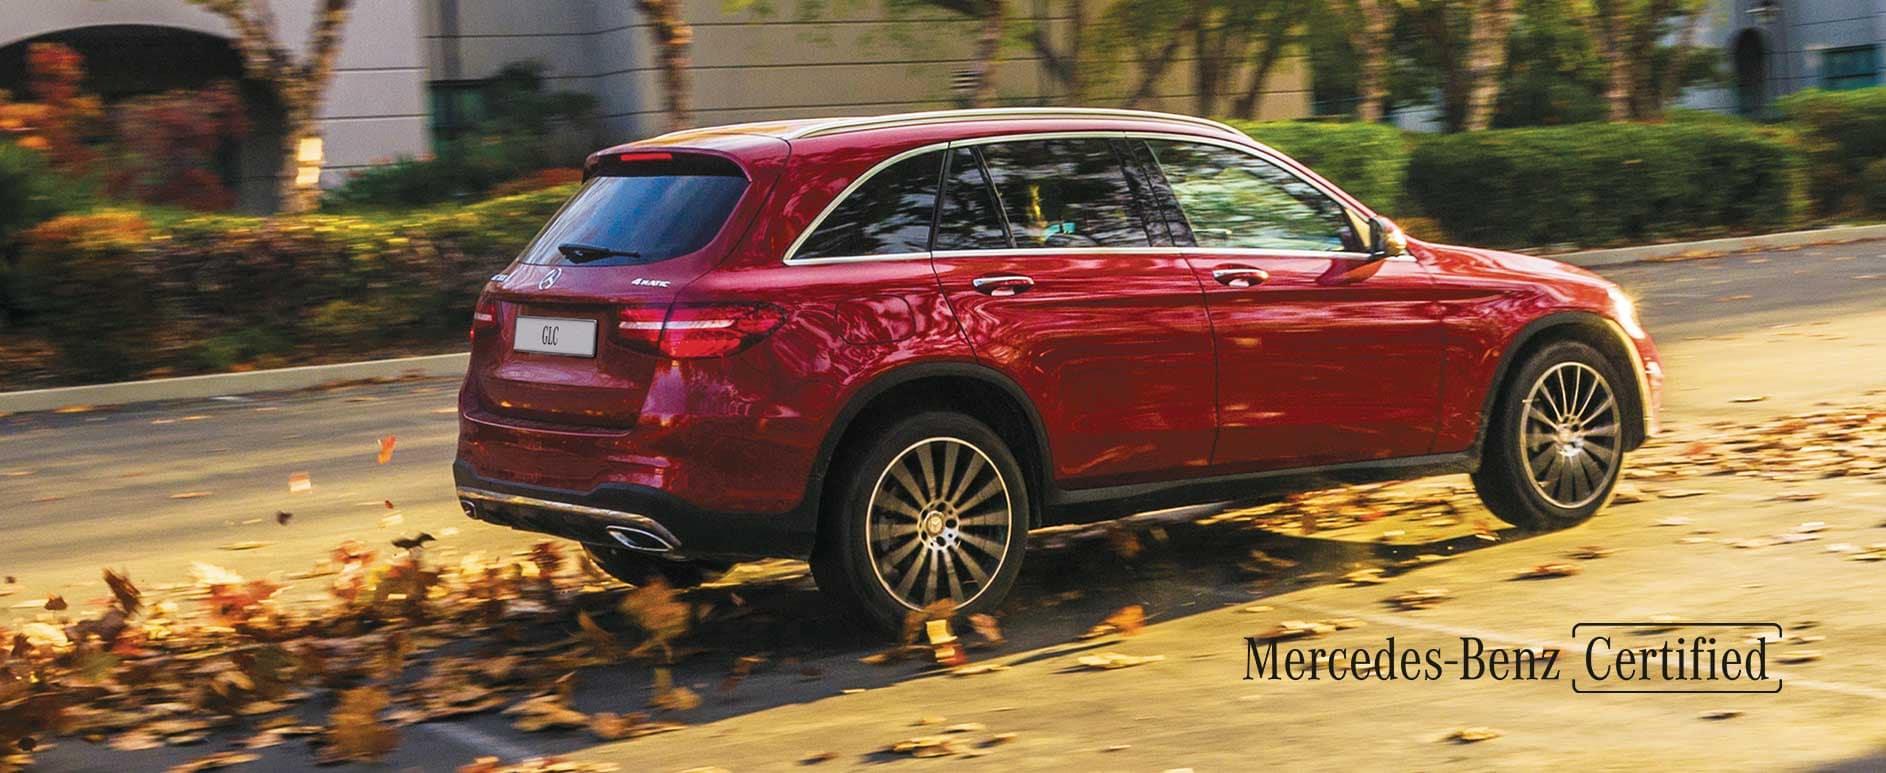 Mercedes-Benz Certified at Star